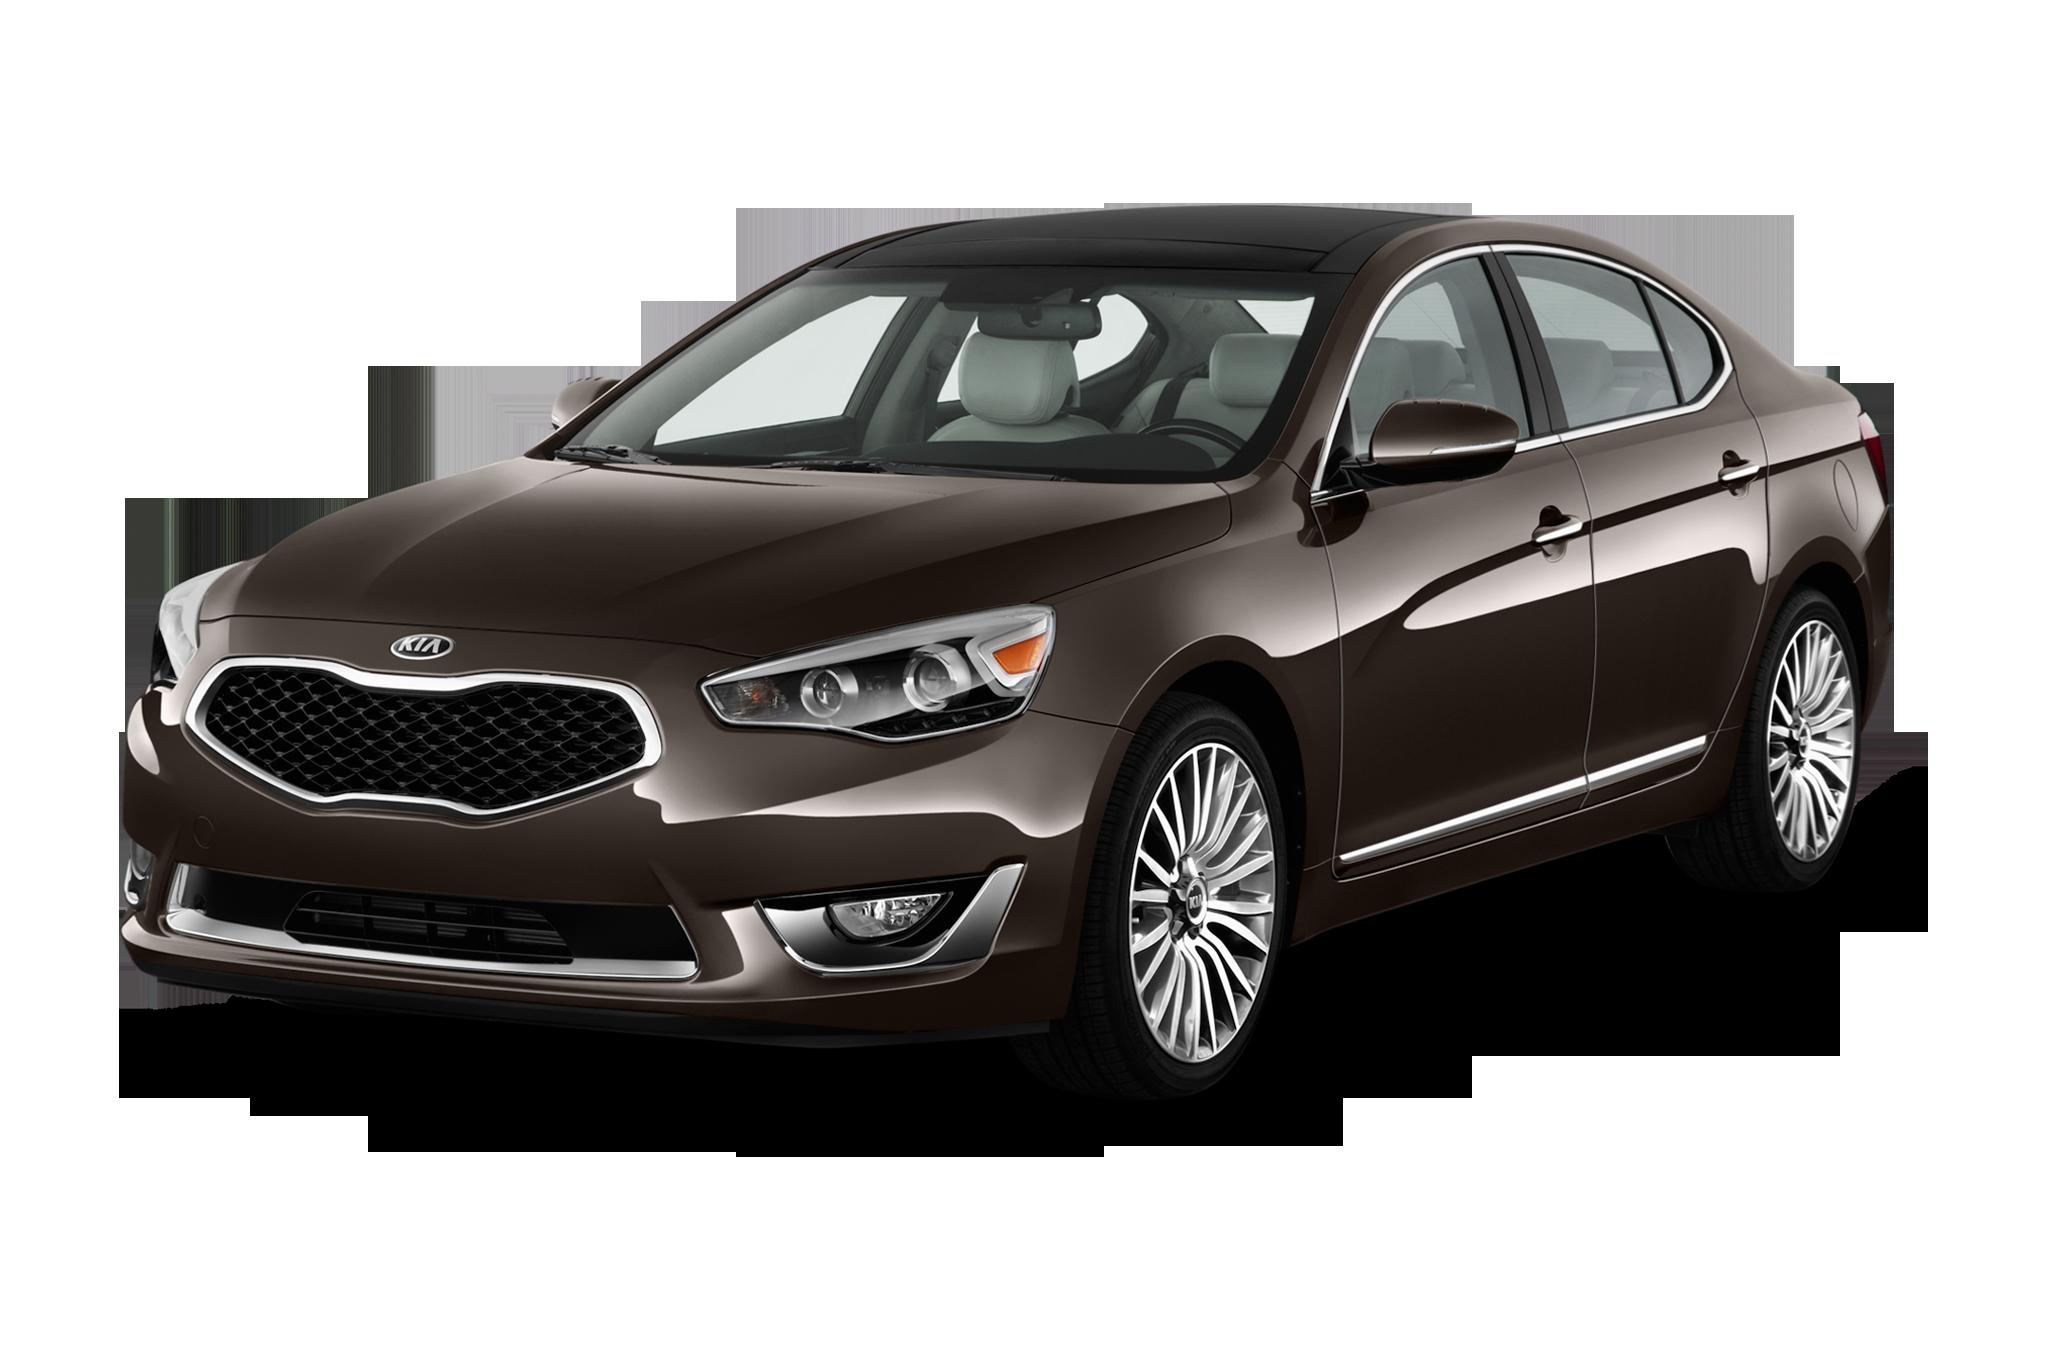 sedan trend kia and cadenza dashboard motor reviews rating cars